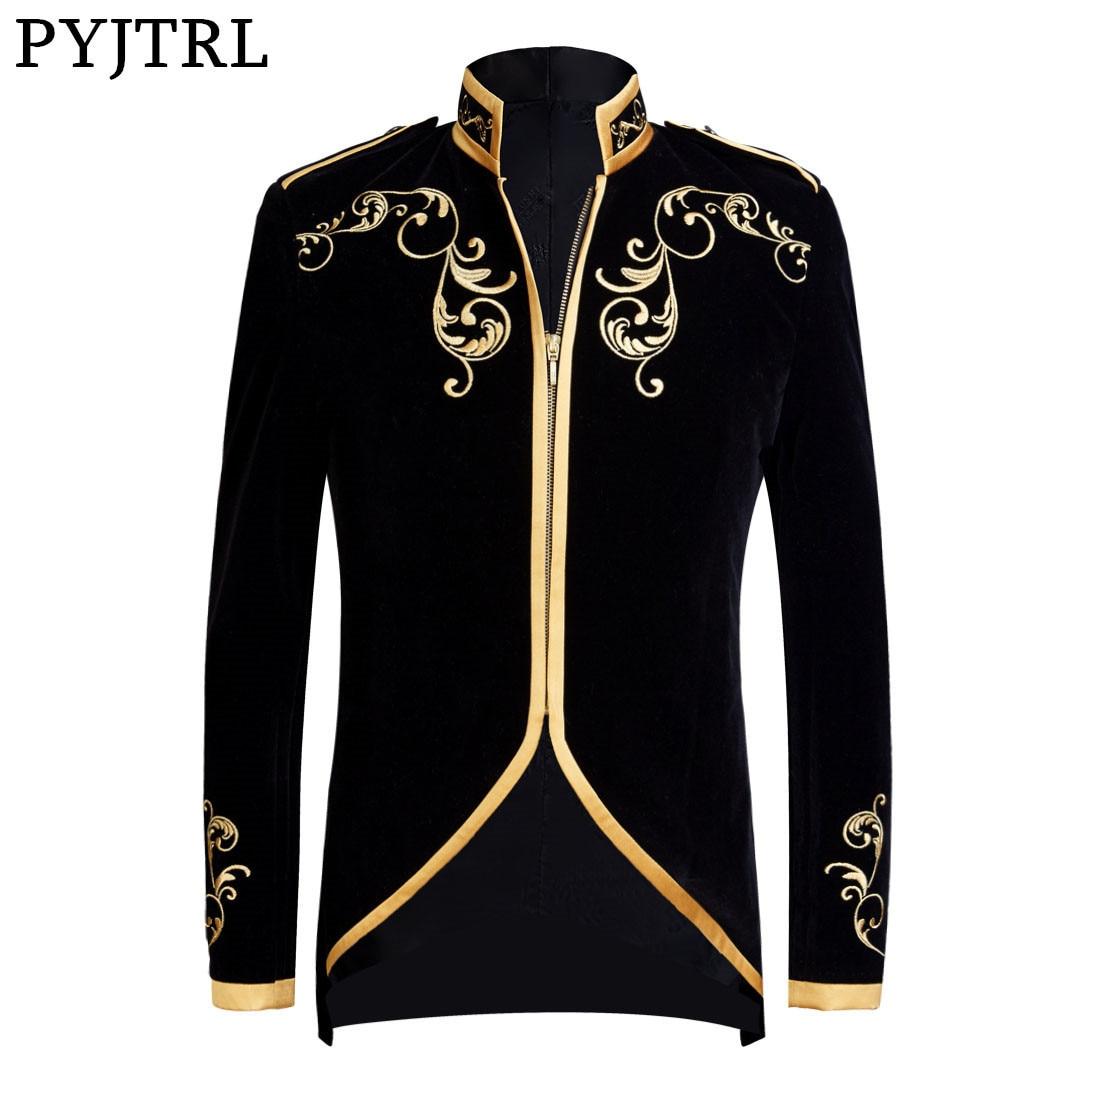 PYJTRL British Style Palace Prince Fashion Black Velvet Gold Embroidery Blazer Wedding Groom Slim Fit Suit Jacket Singers Coat silk